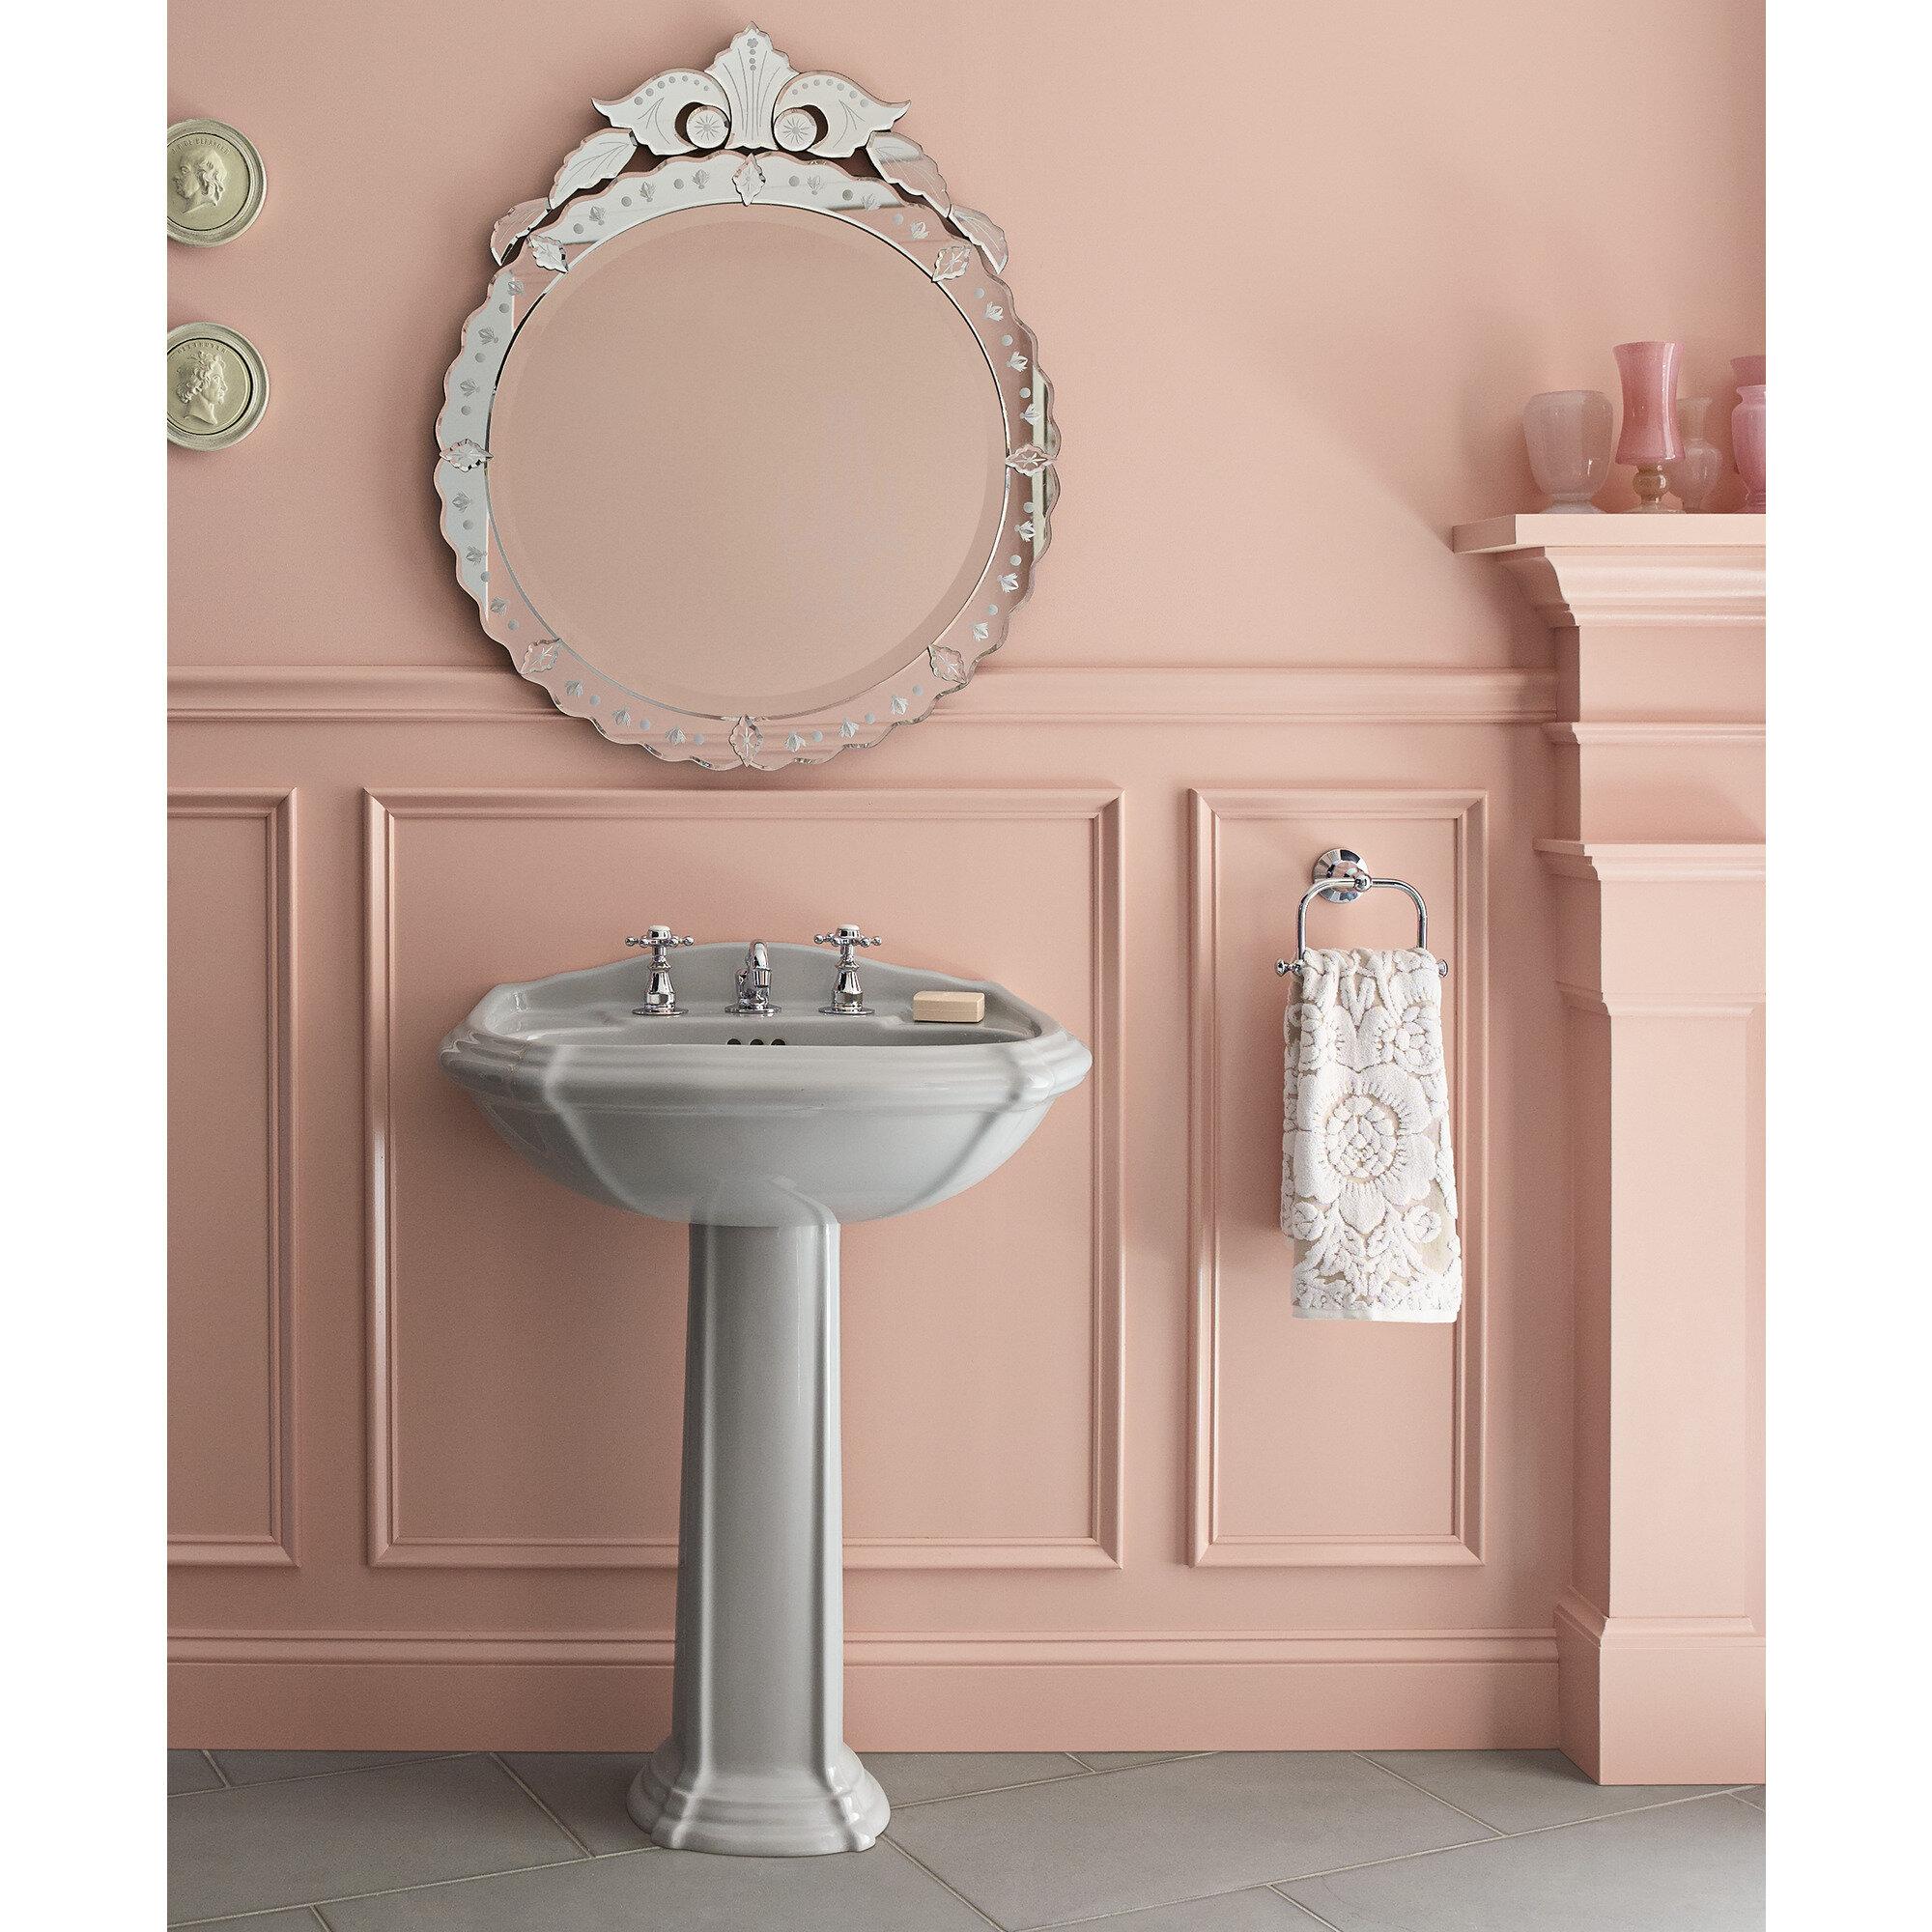 Picture of: Kohler Antique Widespread Bathroom Sink Faucet With 6 Prong Handles Wayfair Ca